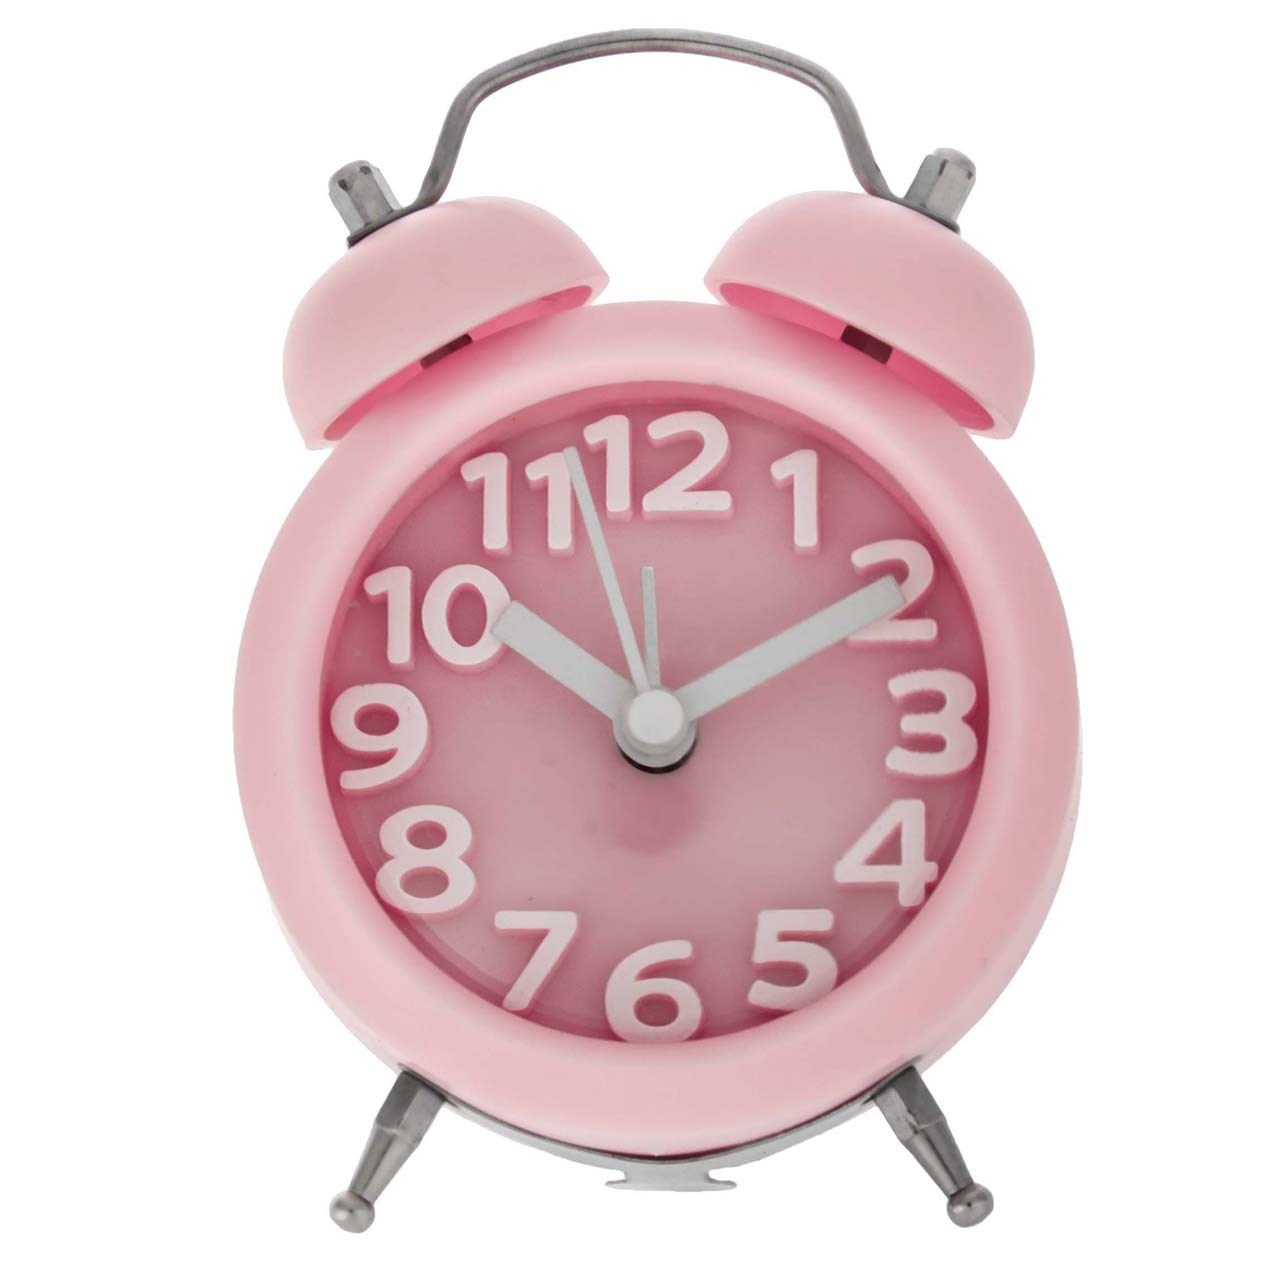 ساعت رومیزی کد 02201022